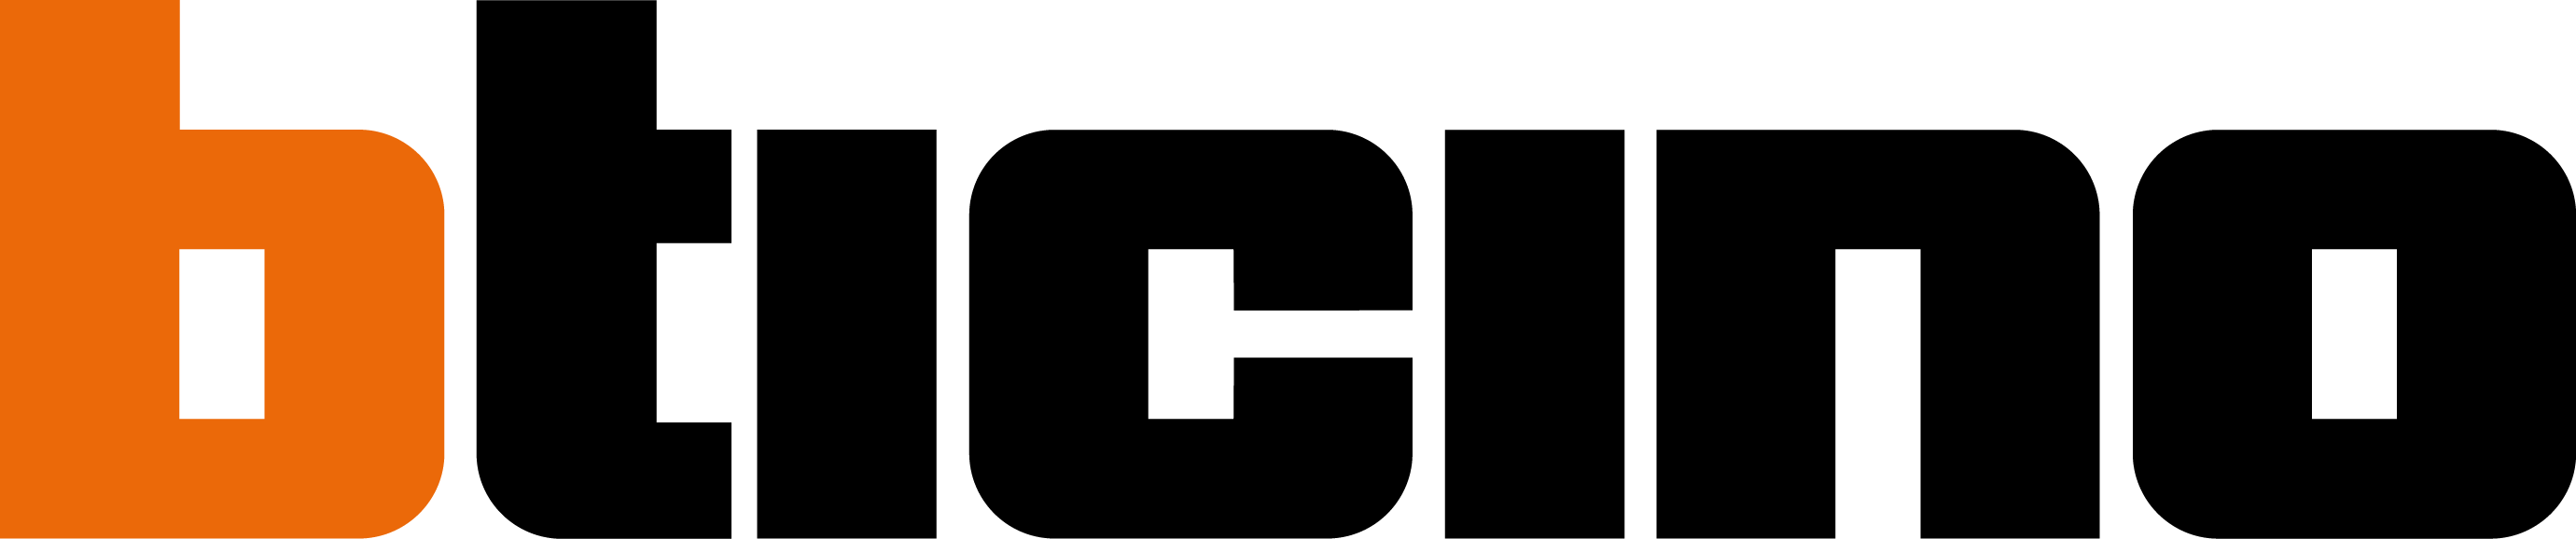 Bticino International